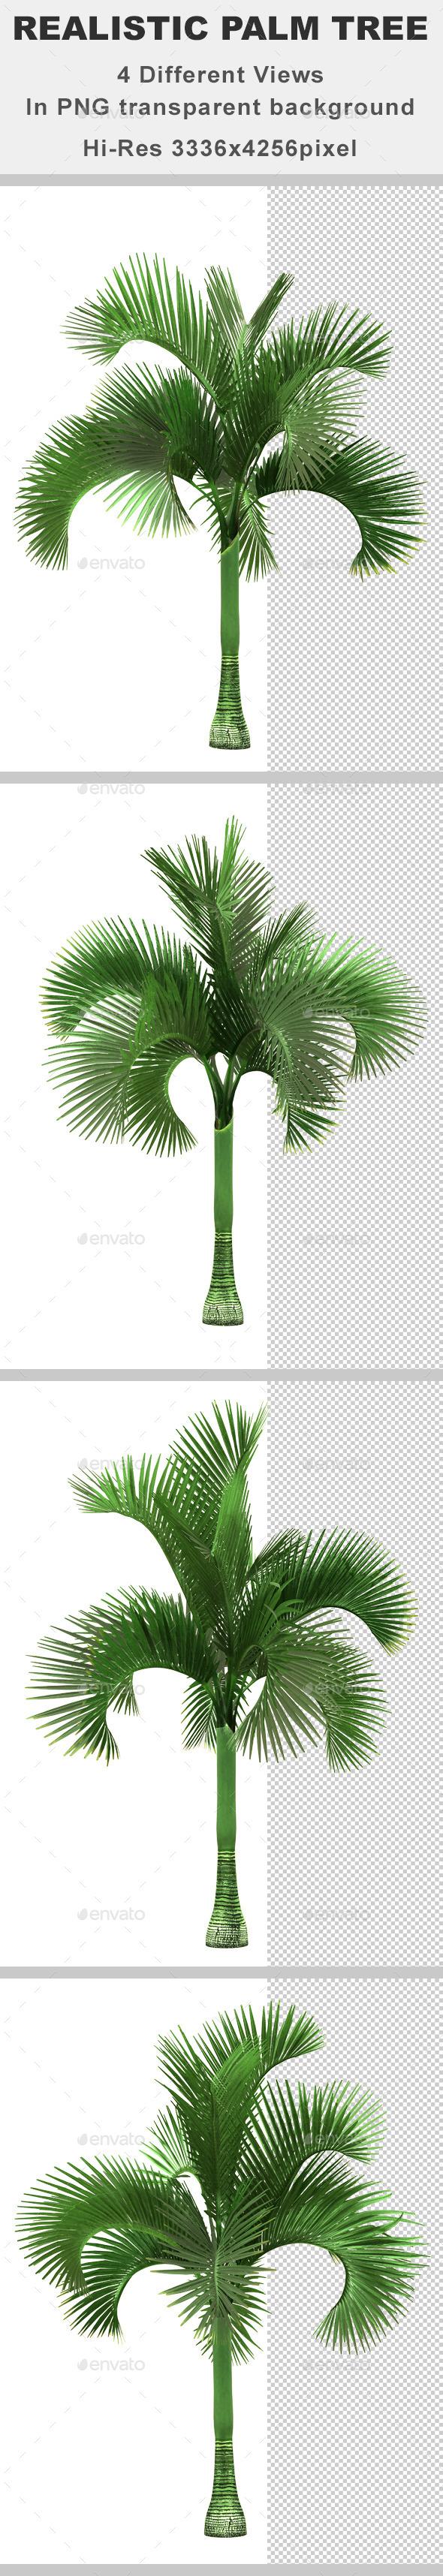 4 Realistic Palm Tree